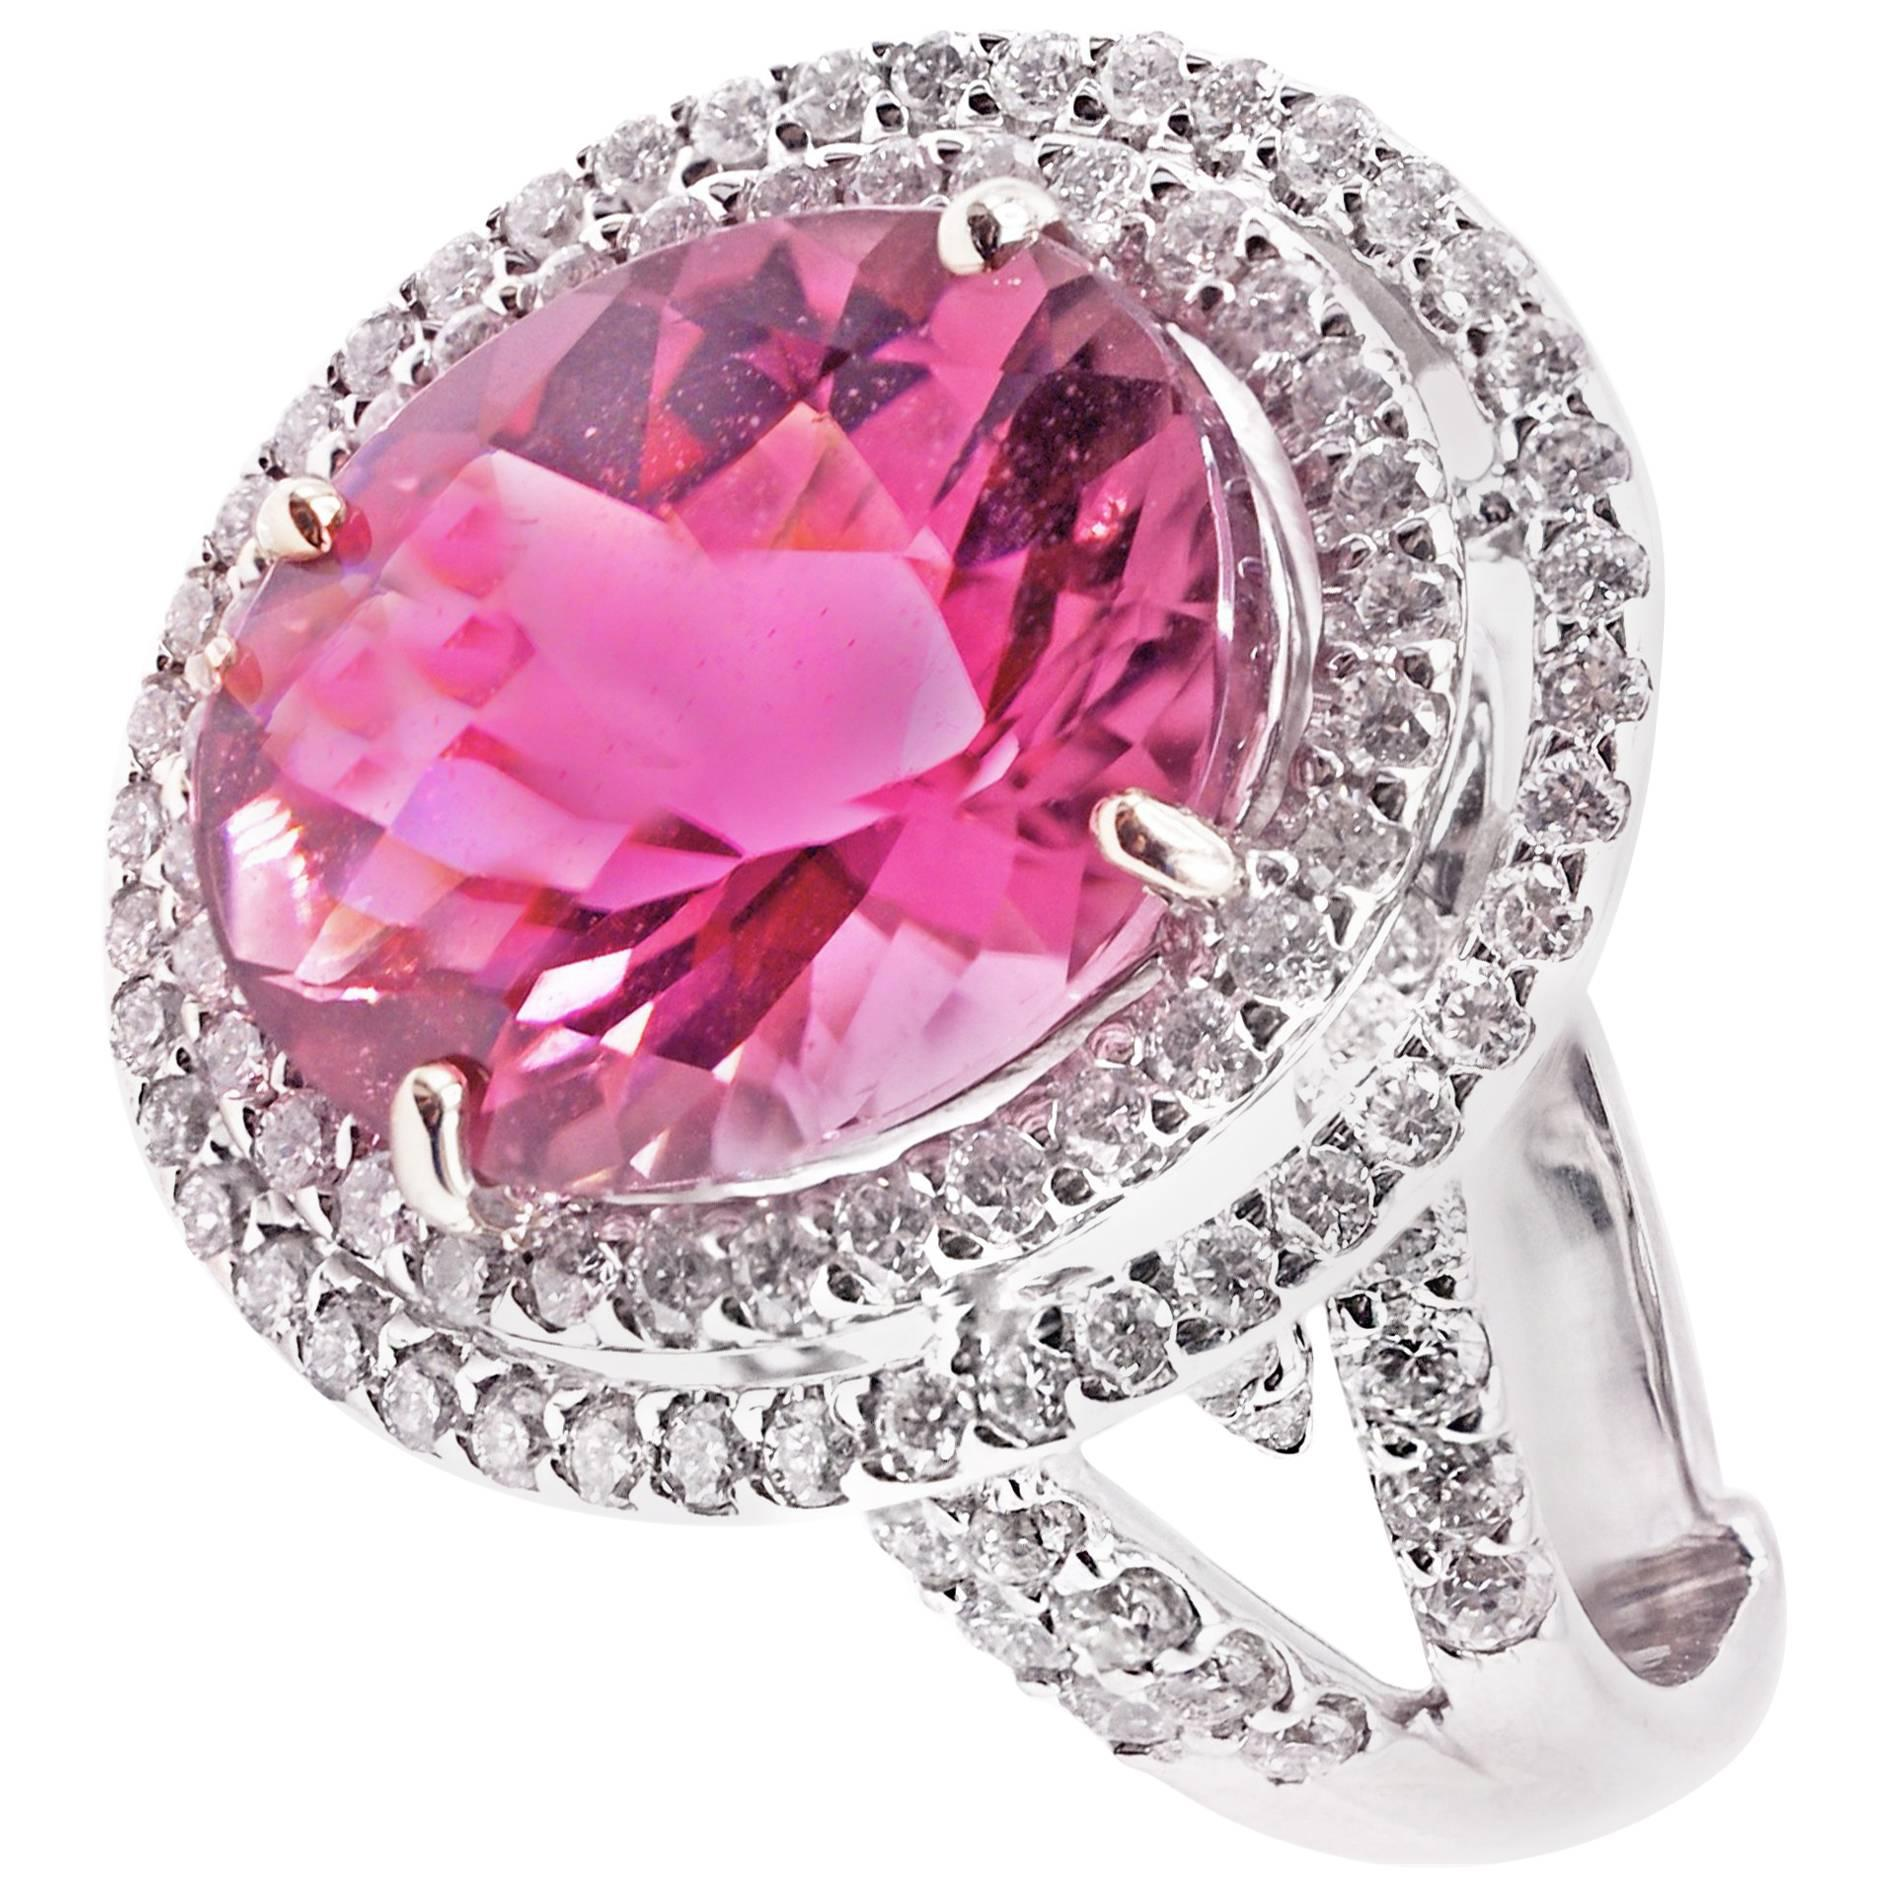 18 Karat Gold Aquamarine Diamond Modernist Ring For Sale at 1stdibs